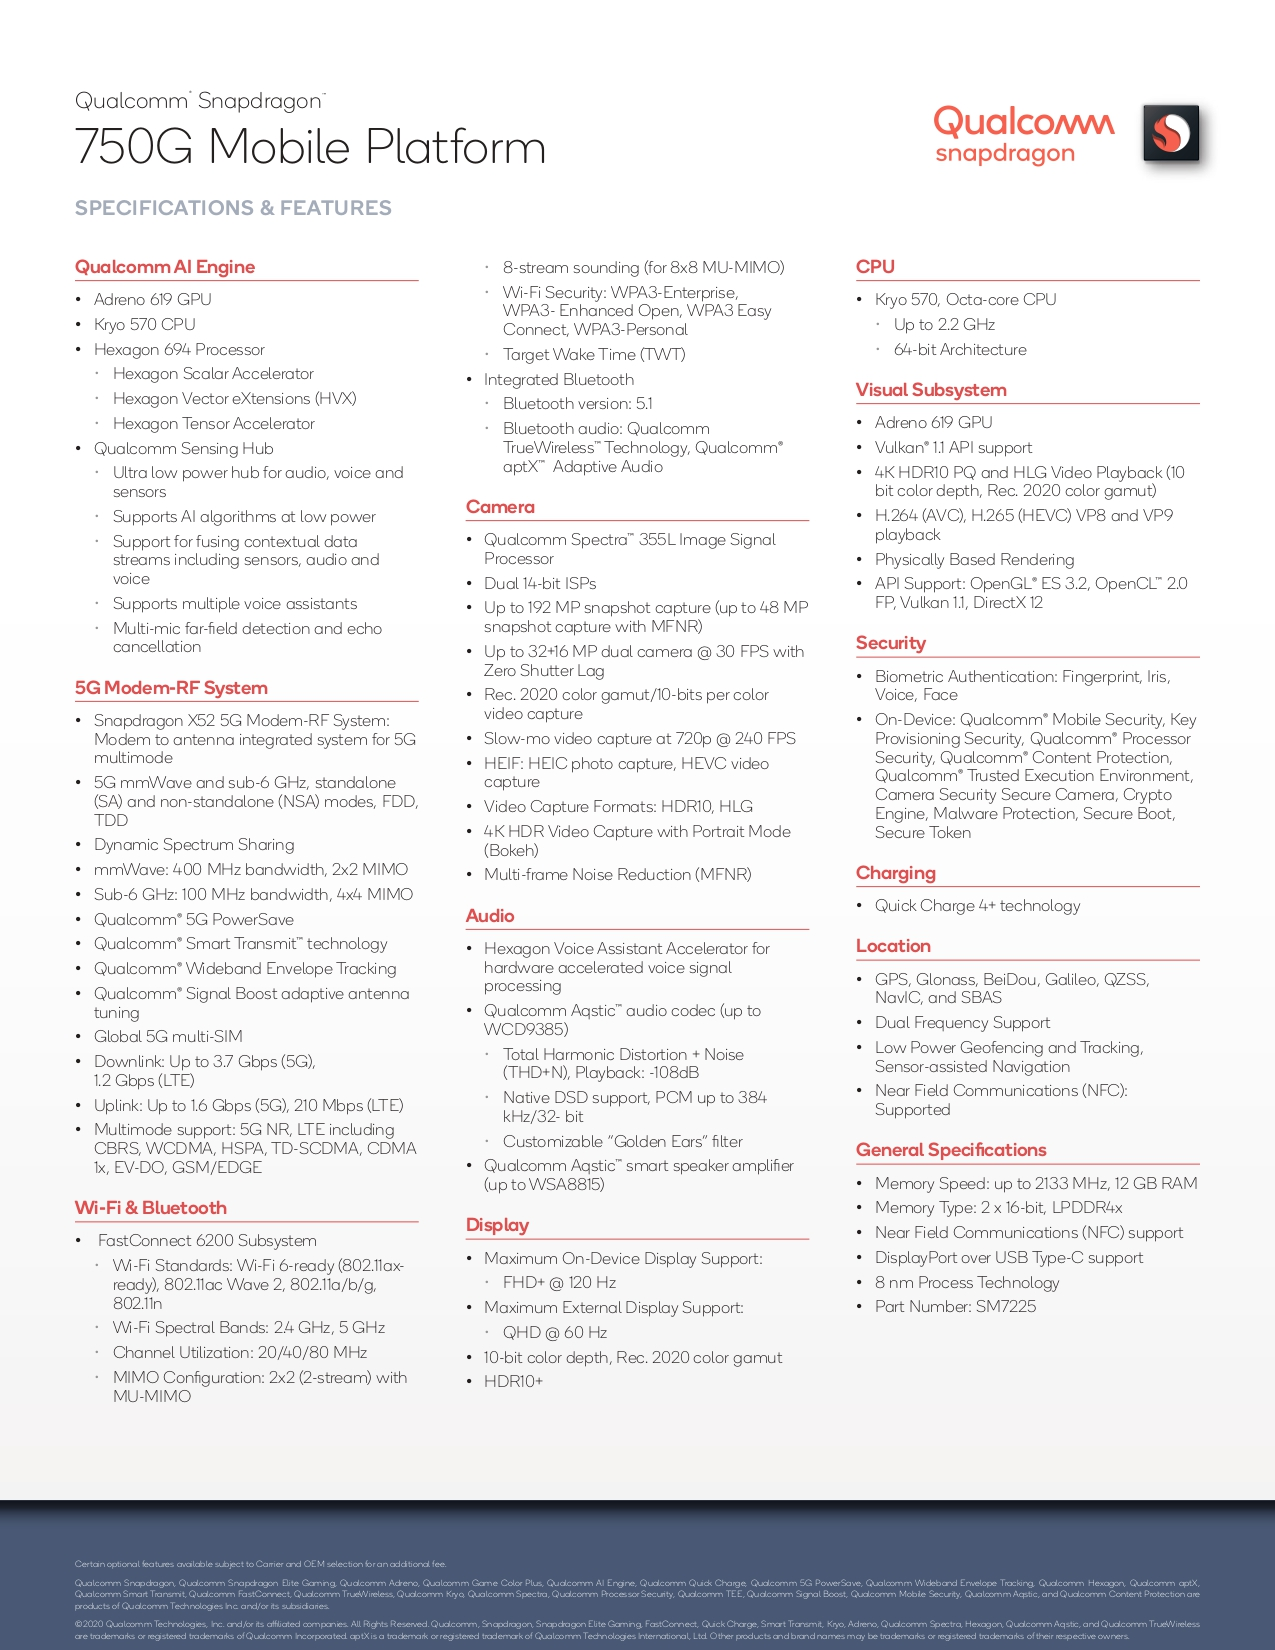 caratteristiche Qualcomm Snapdragon 750G 5G